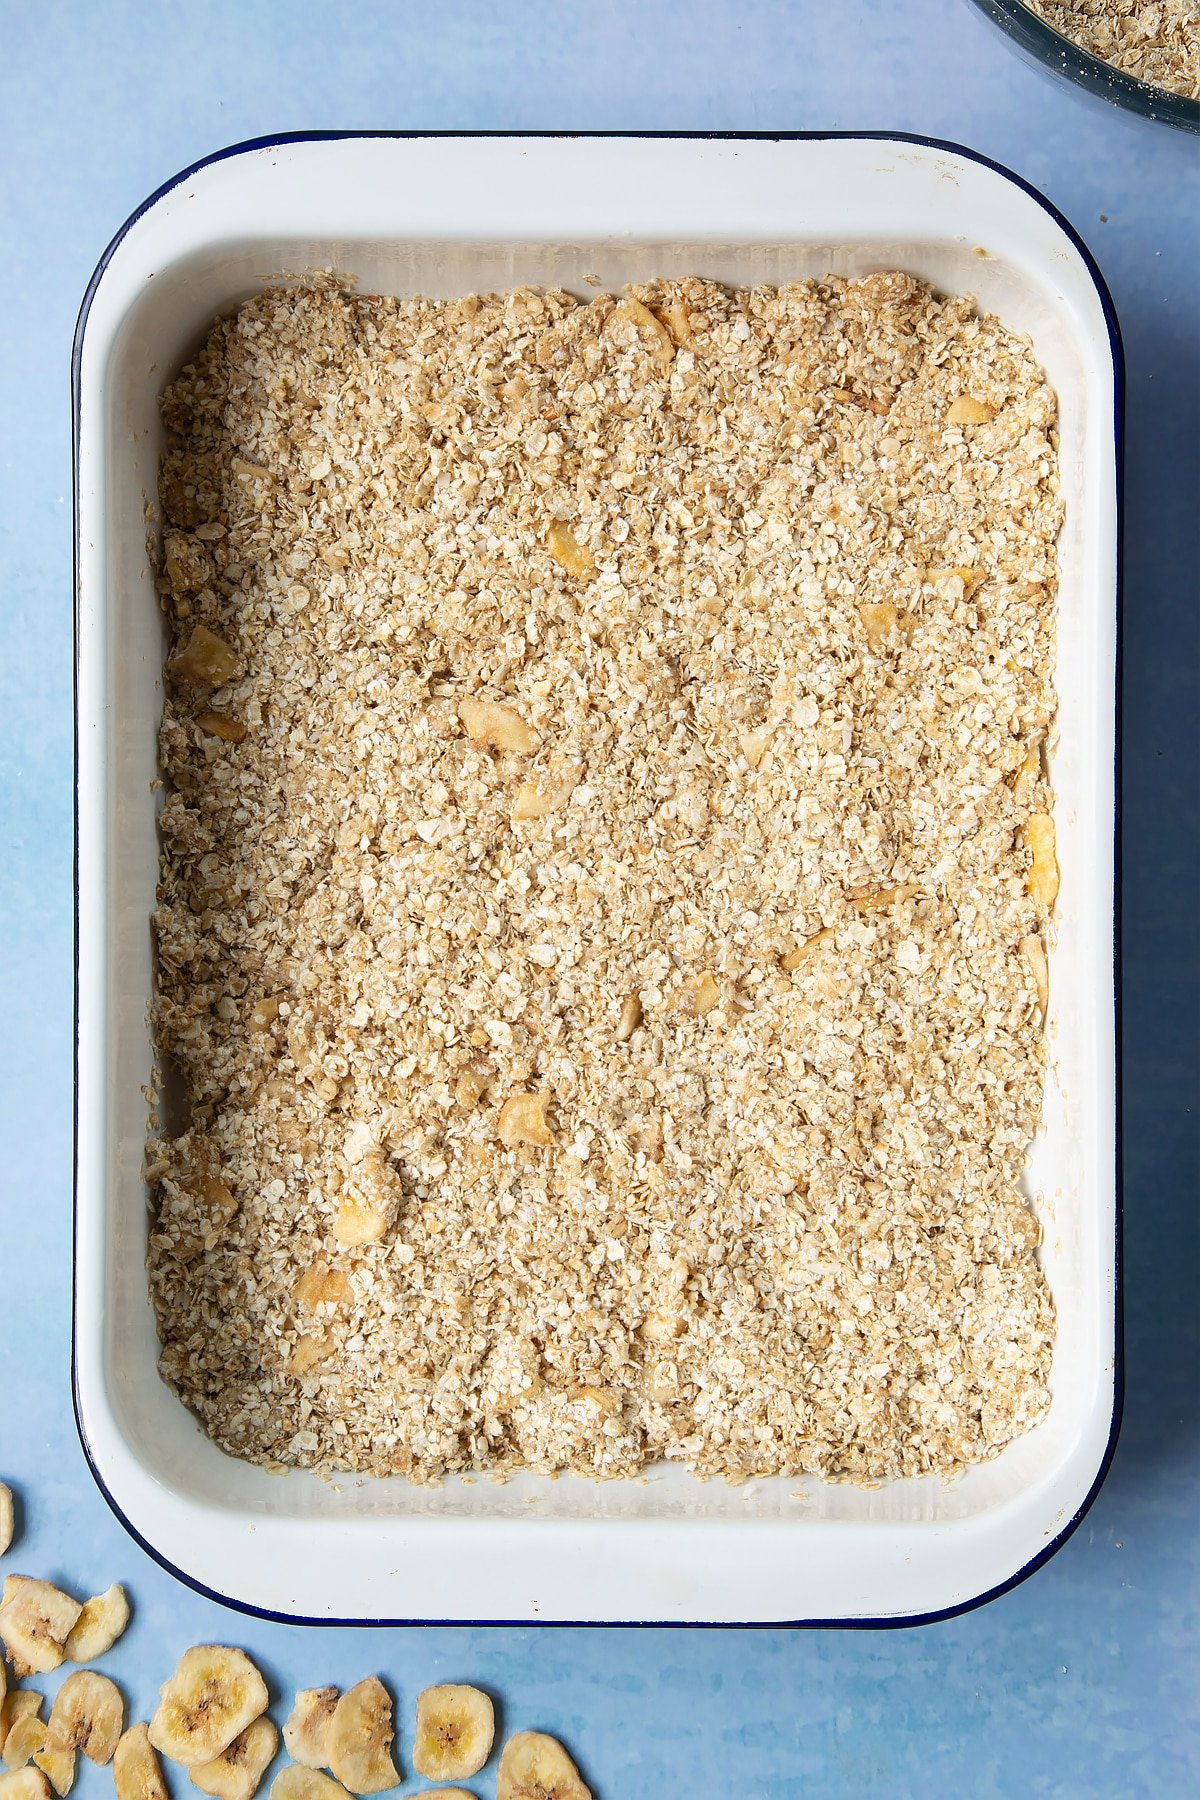 A white, medium-sized roasting tray with banana coconut granola mix pressed into it.